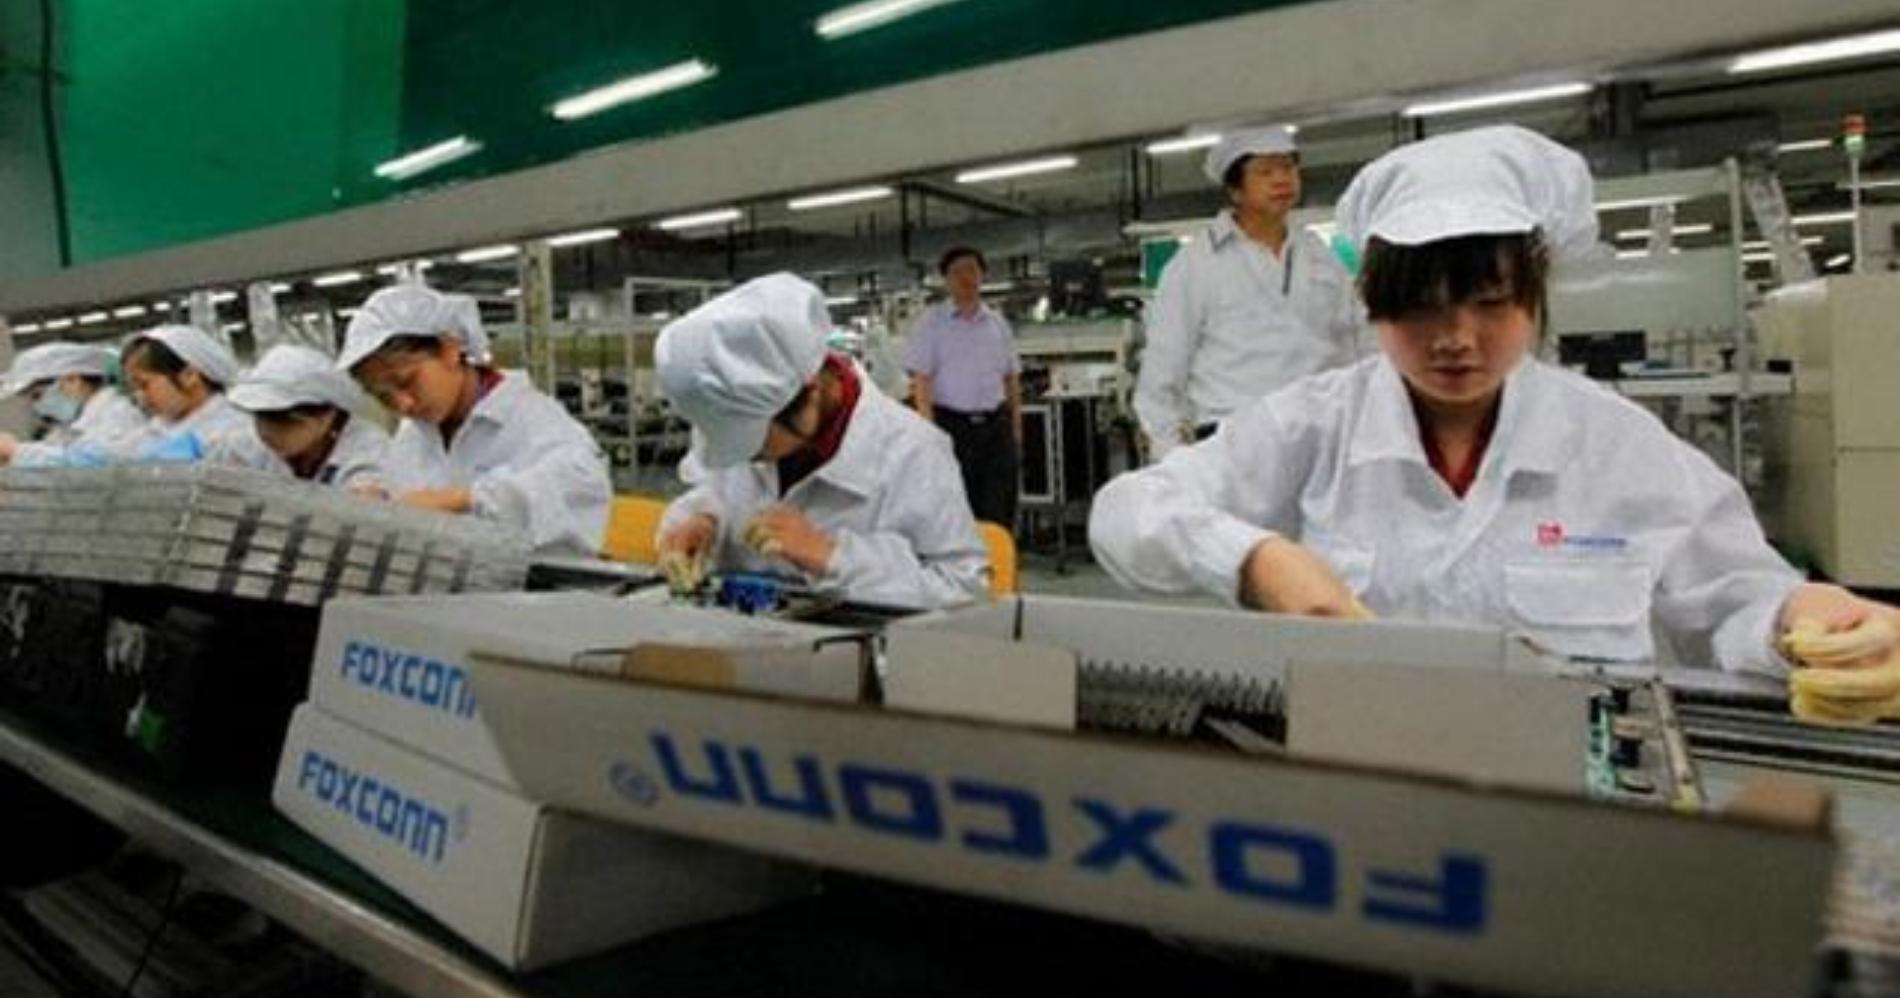 Foxconn Factory Web Bisnis Muda - Google